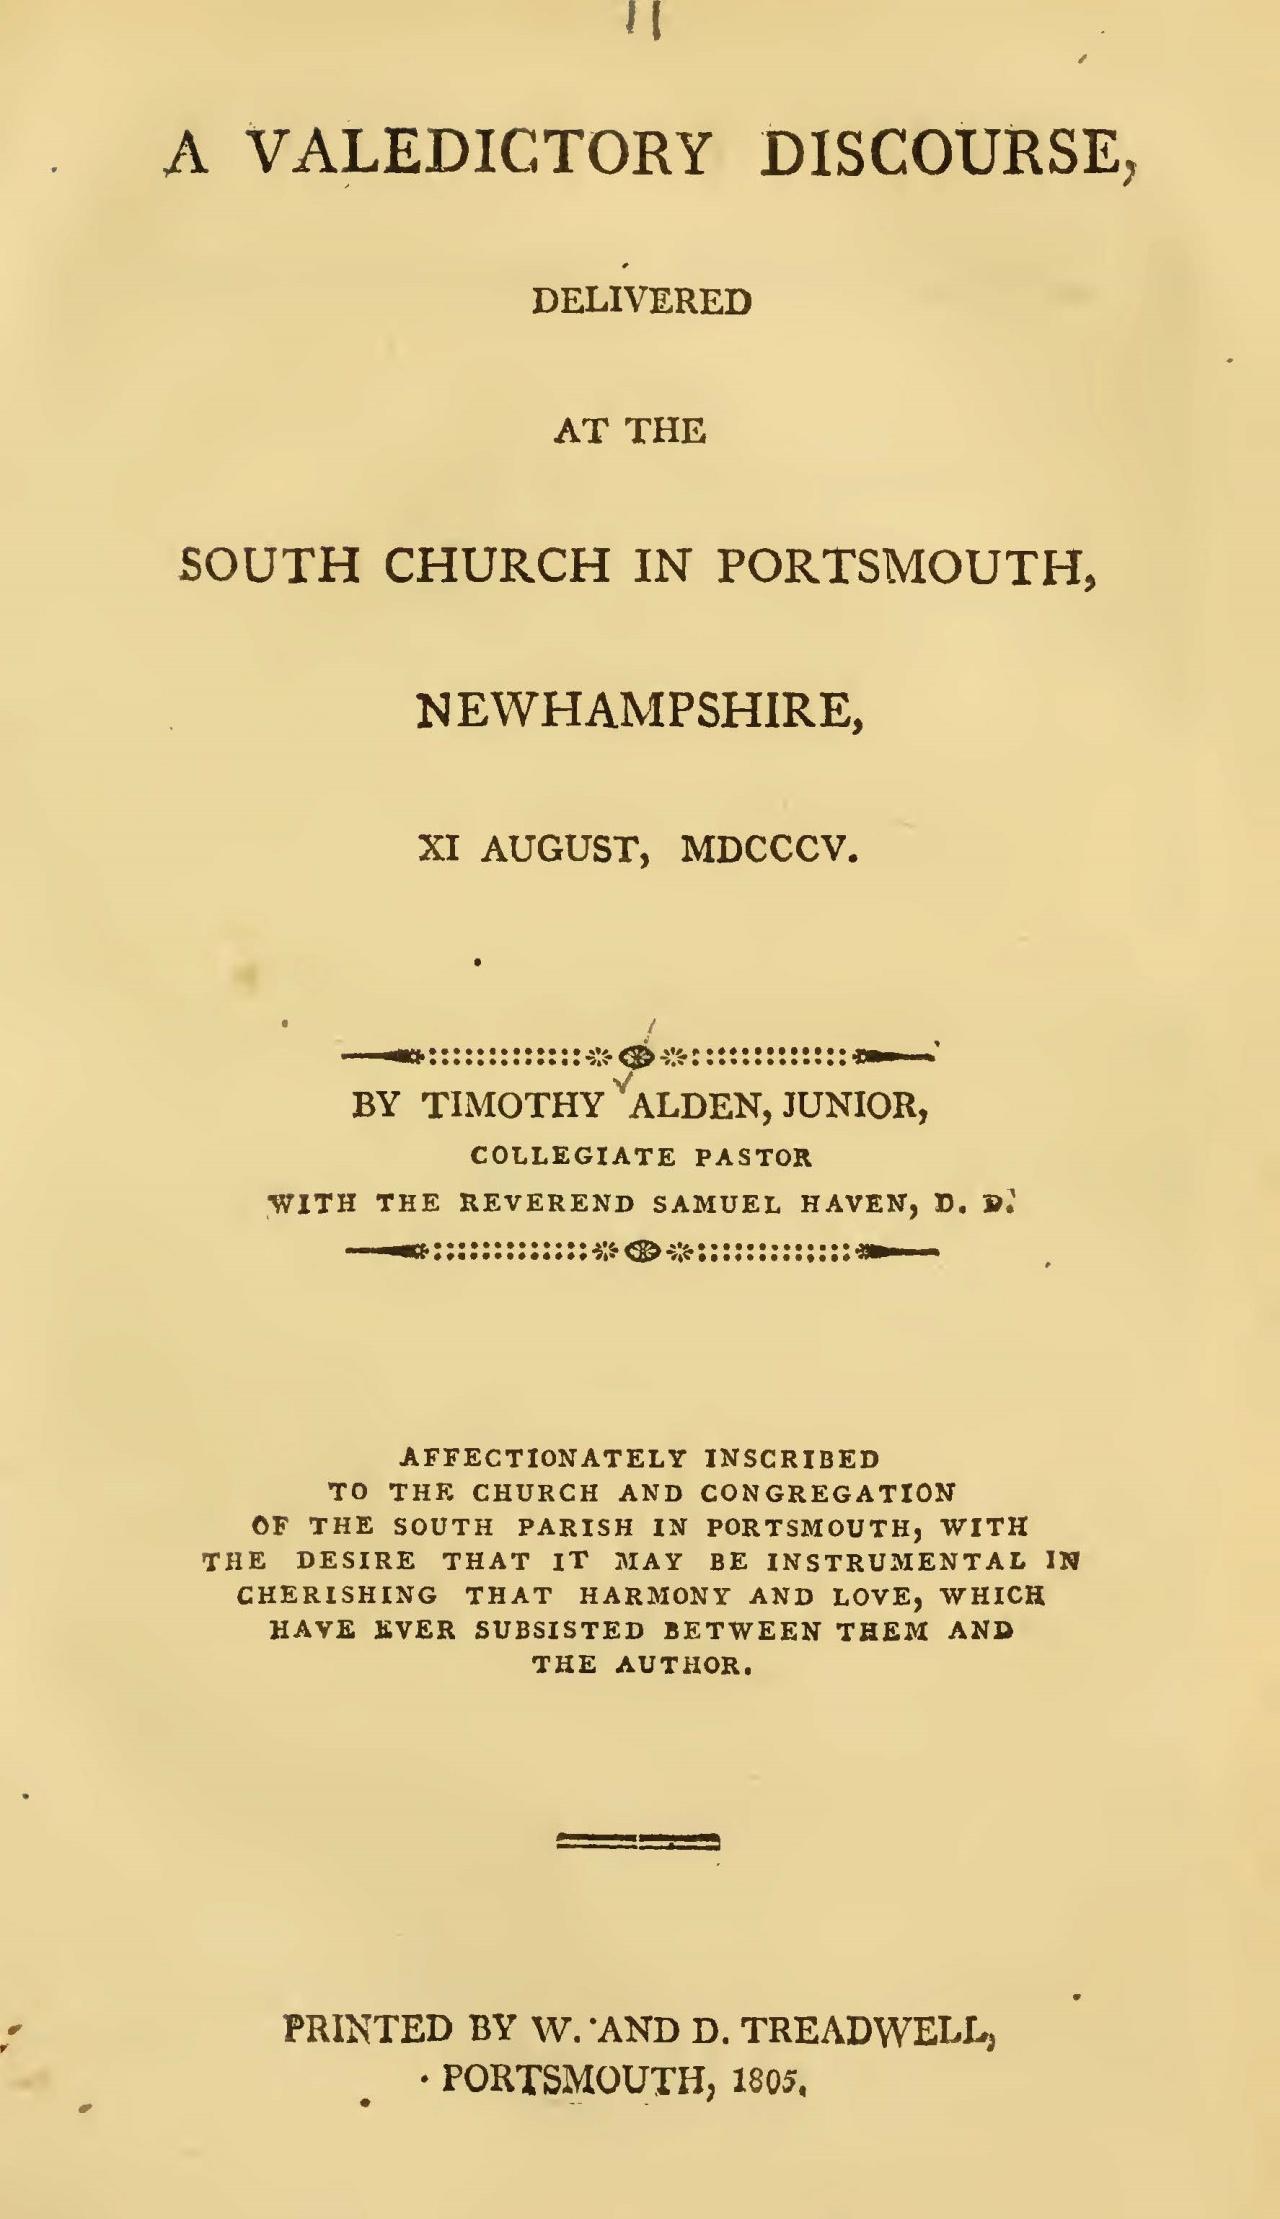 Alden, Jr., Timothy, A Valedictory Discourse Title Page.jpg